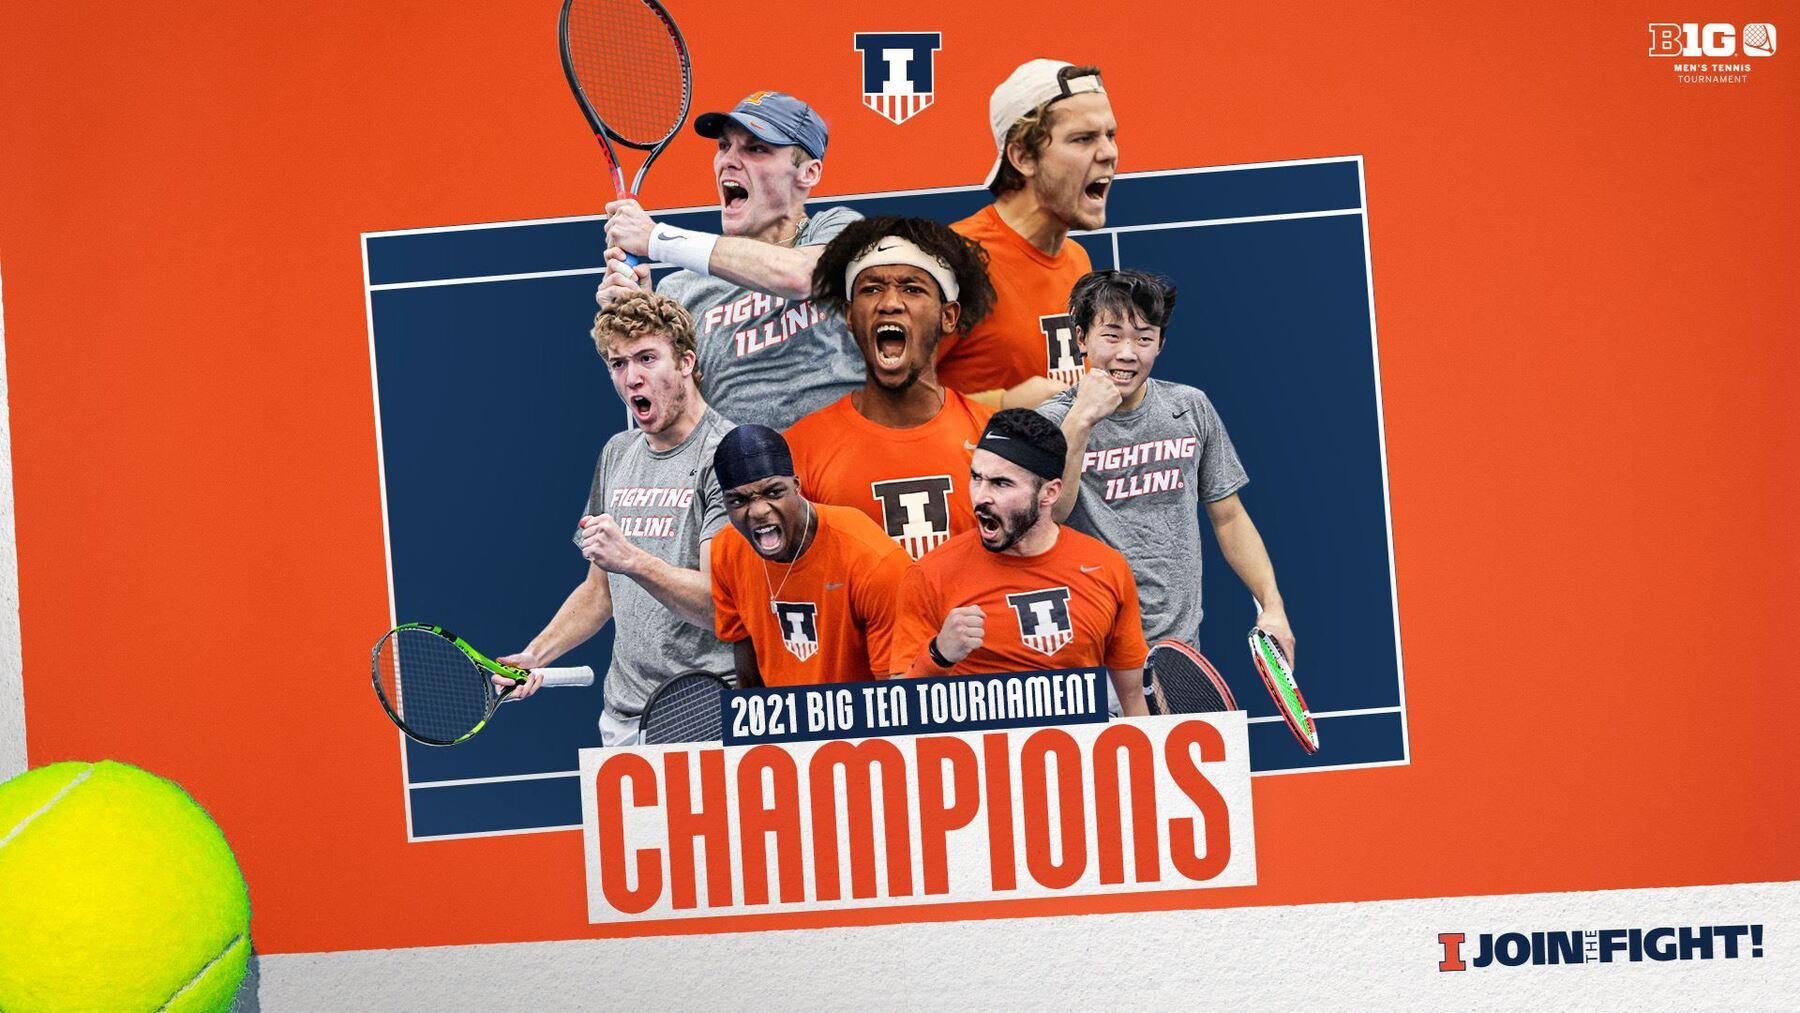 Graphic text: 2021 Big Ten Tournament Champions